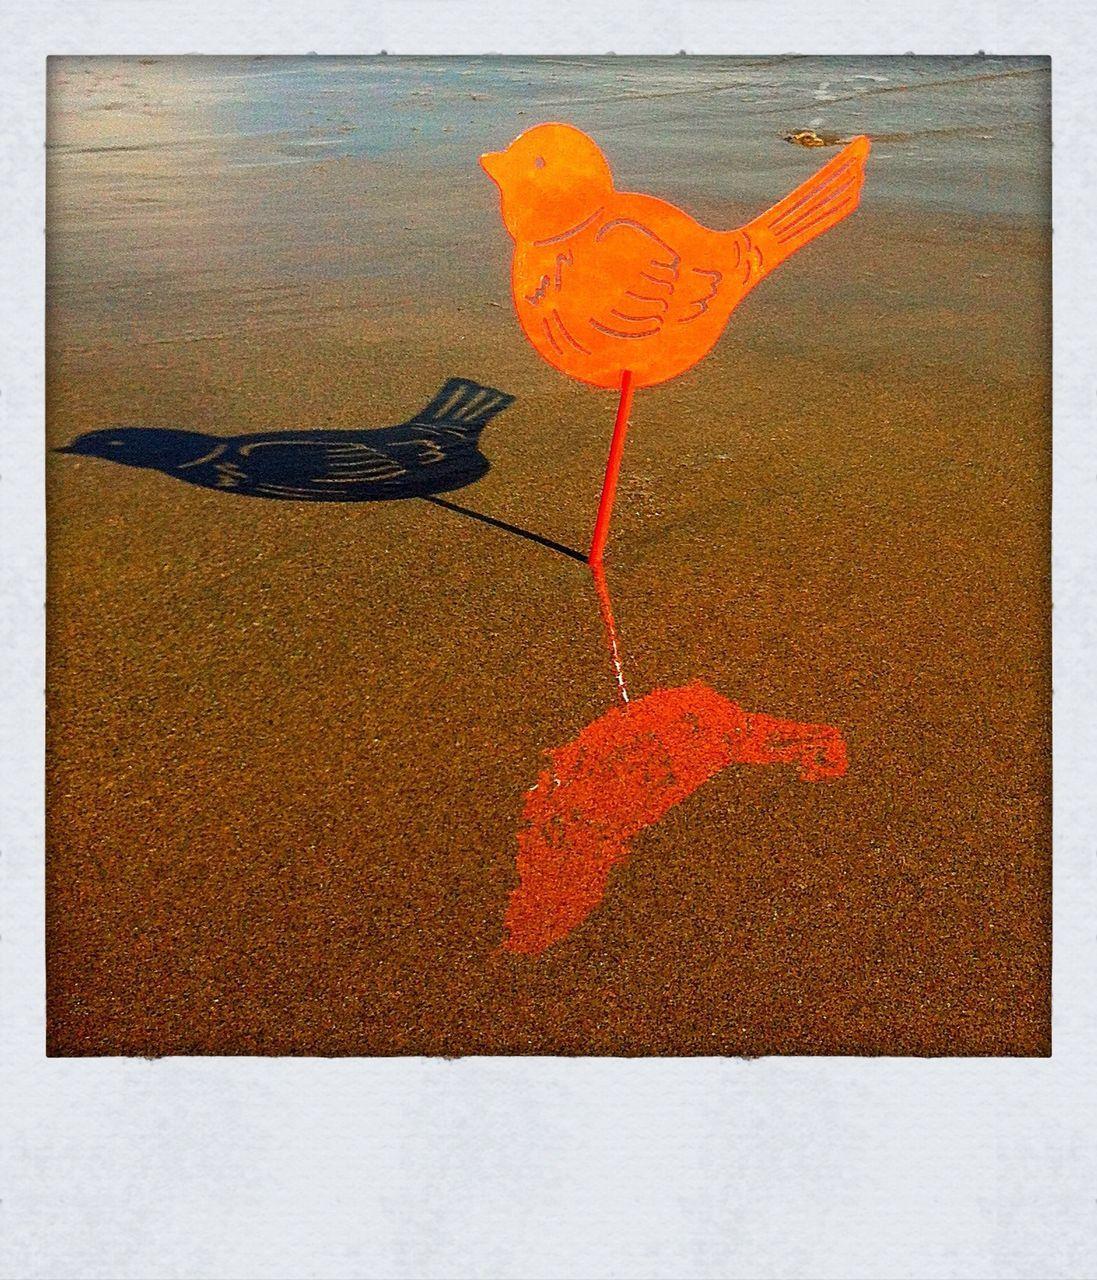 Metal Bird Stack To Sand On Beach